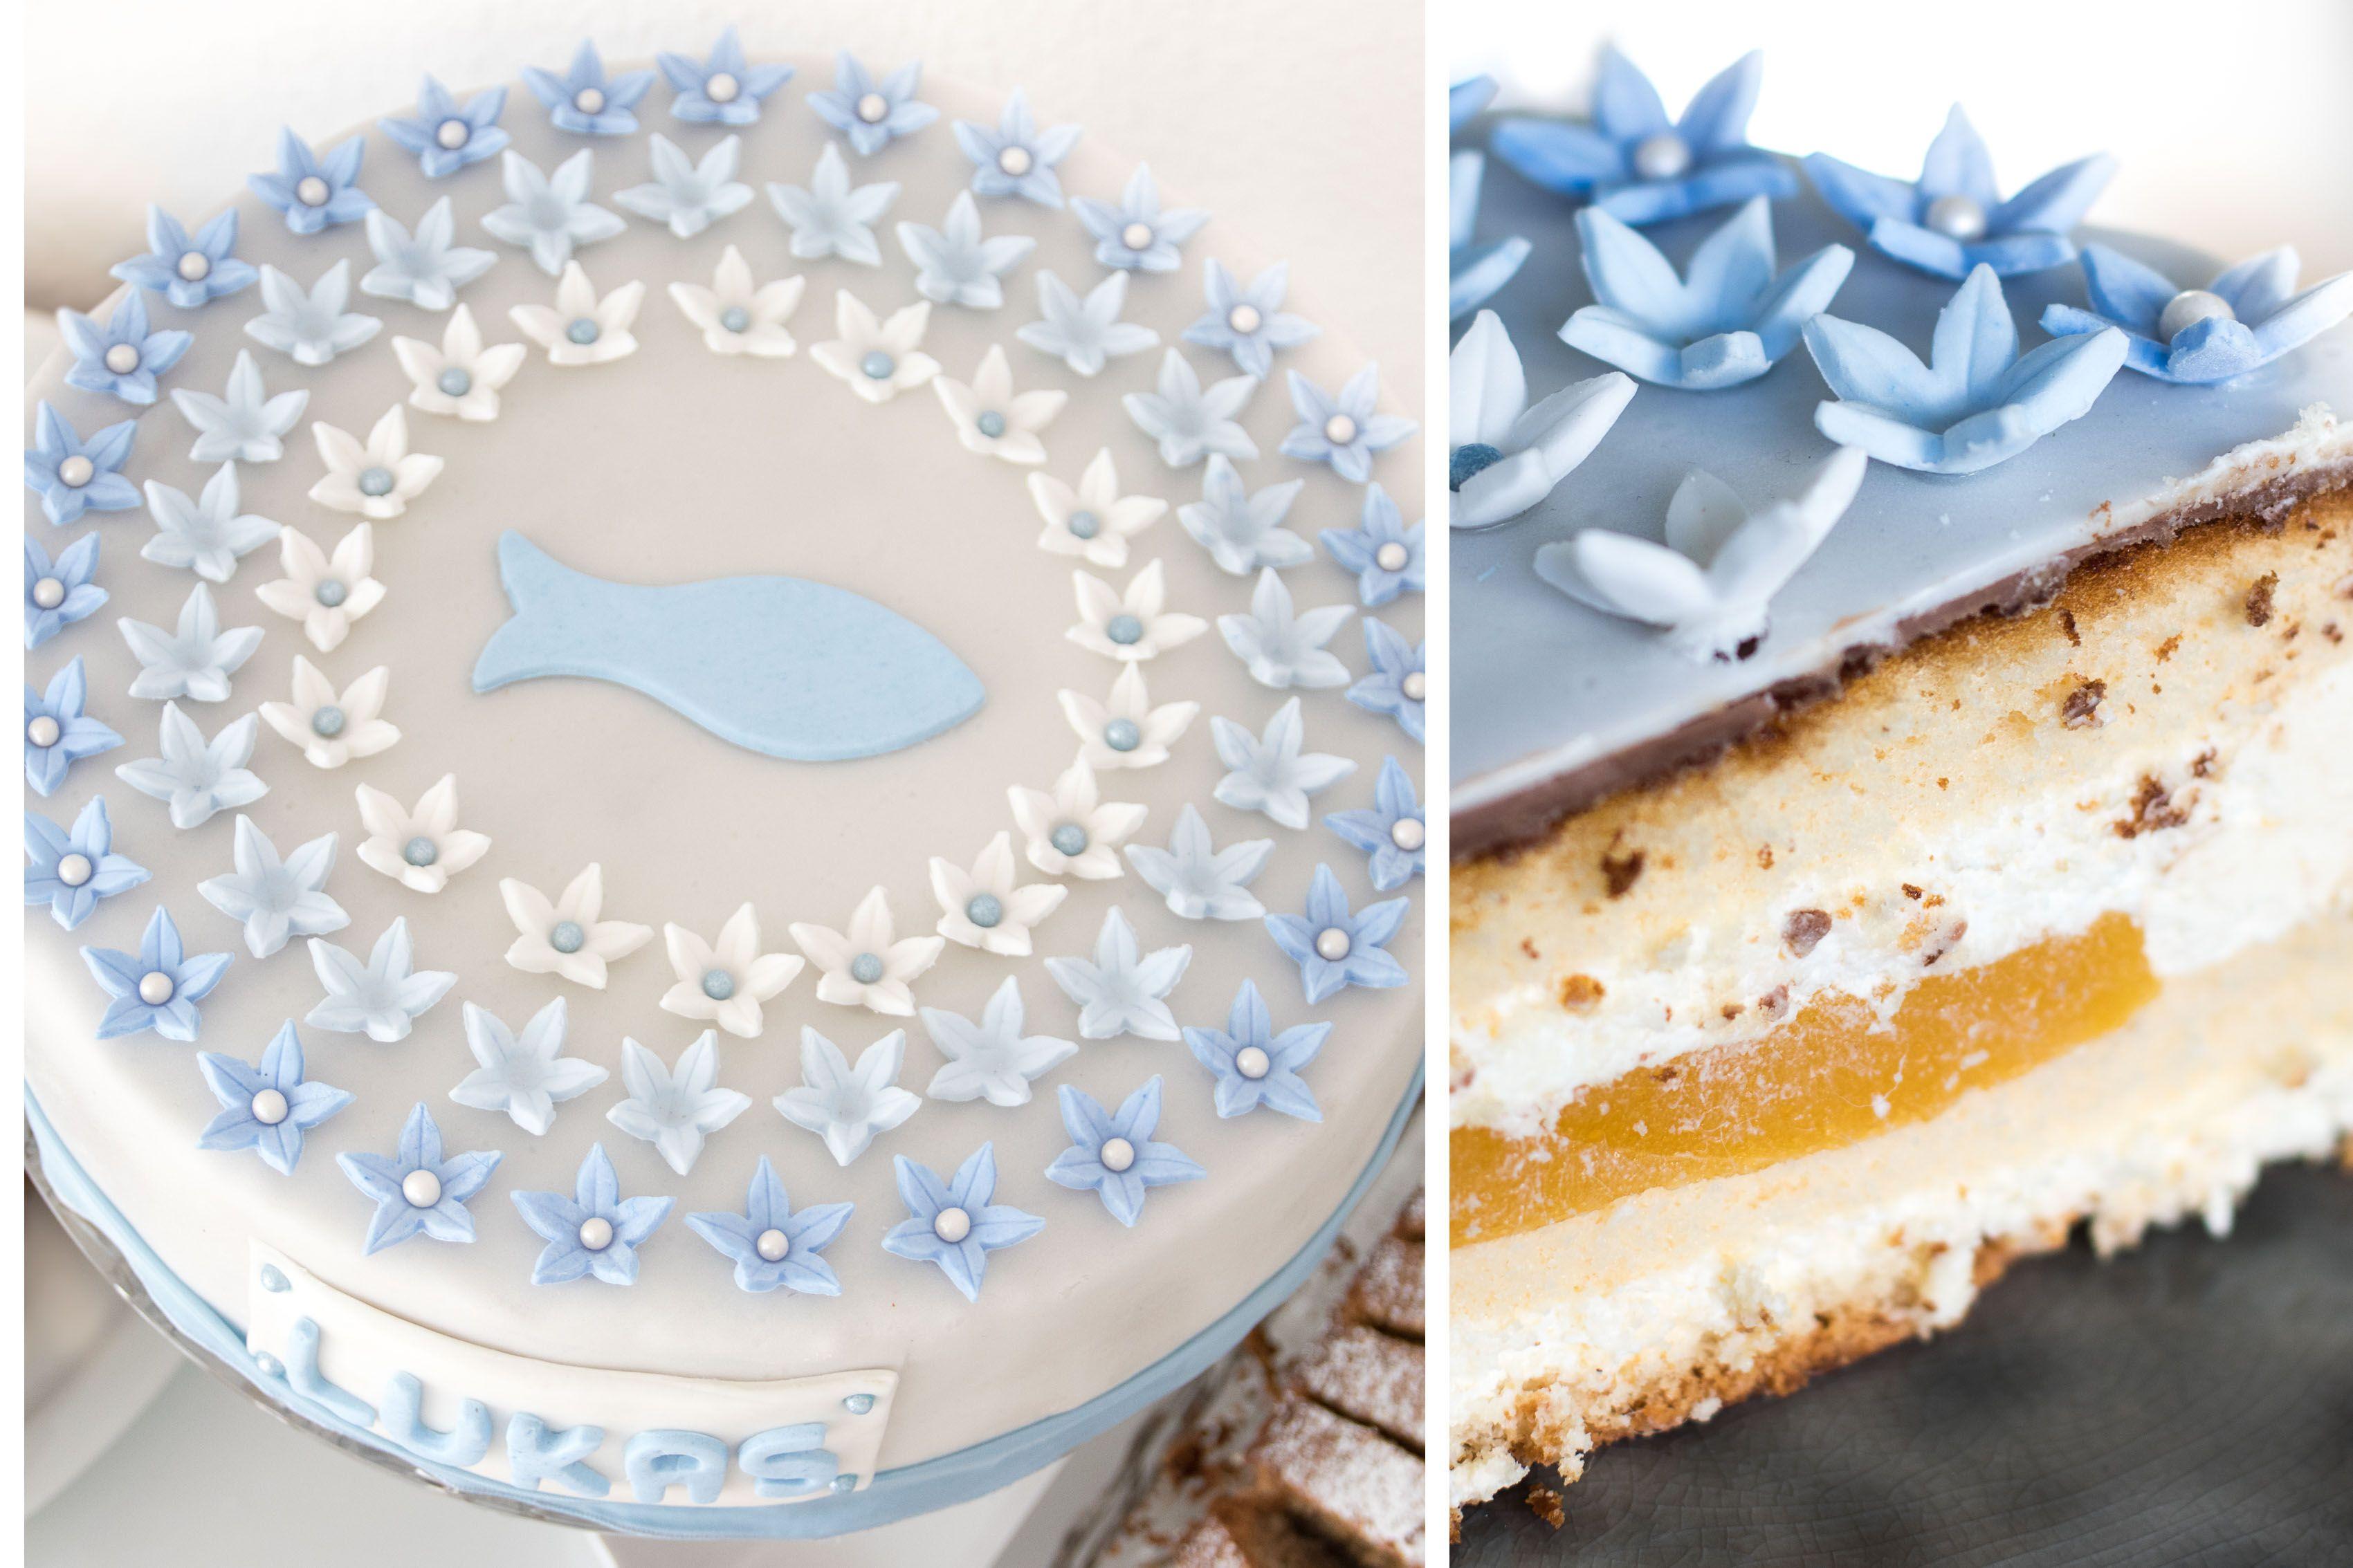 Kommunion Torte Fur Jungs Selbstgemacht Elf19 De Kommunion Torte Torte Fisch Kommunion Kommunionkuchen